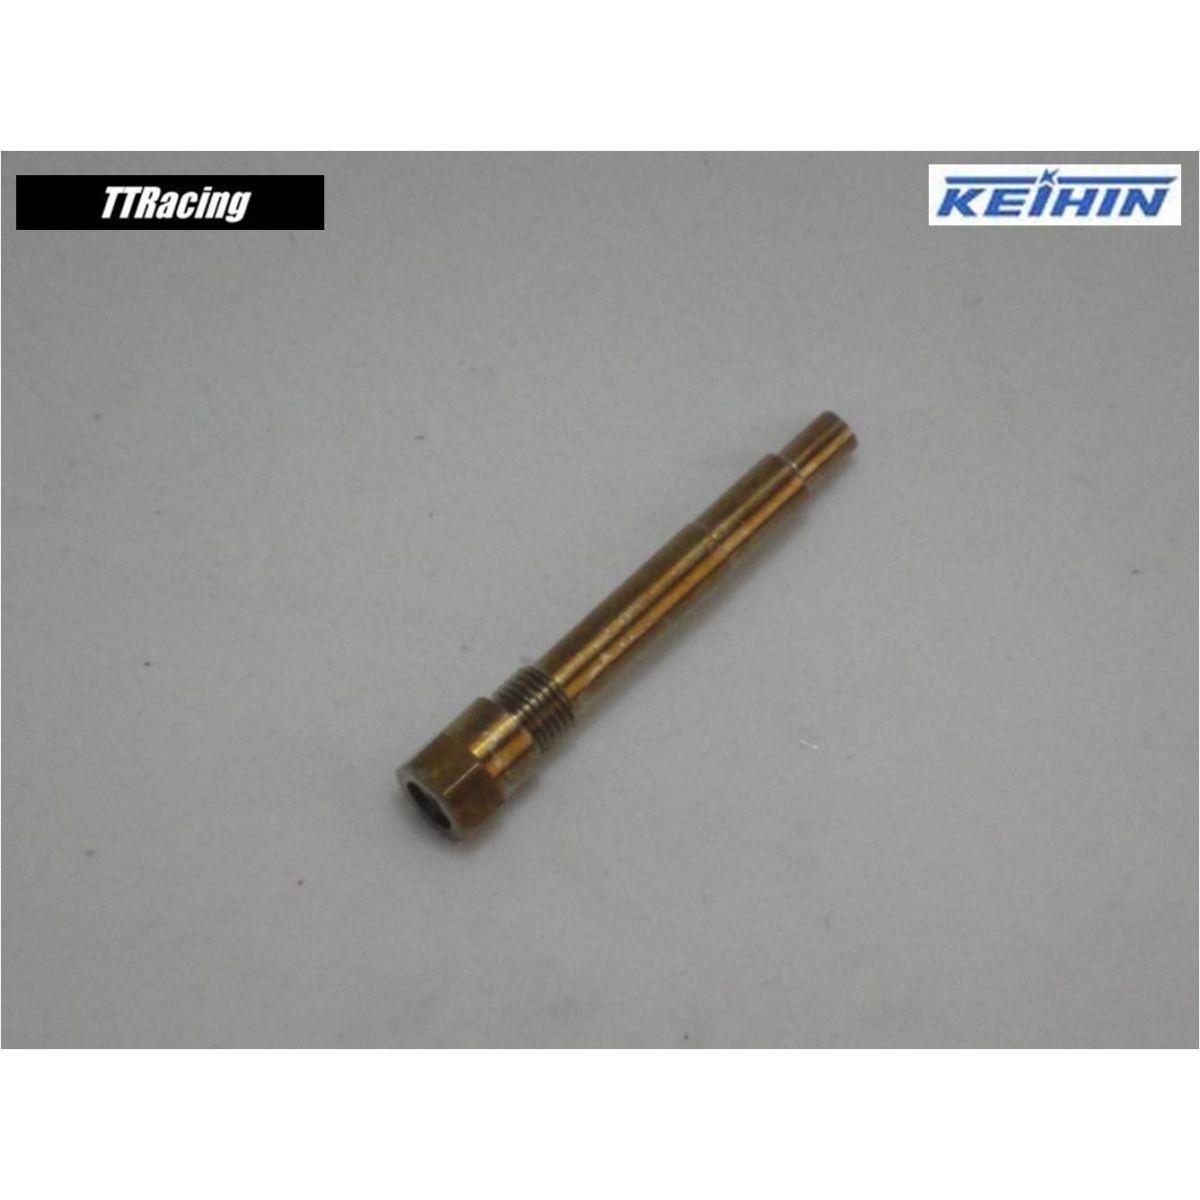 Difusor carburador CR FLAT FCR-MX  - T & T Soluções